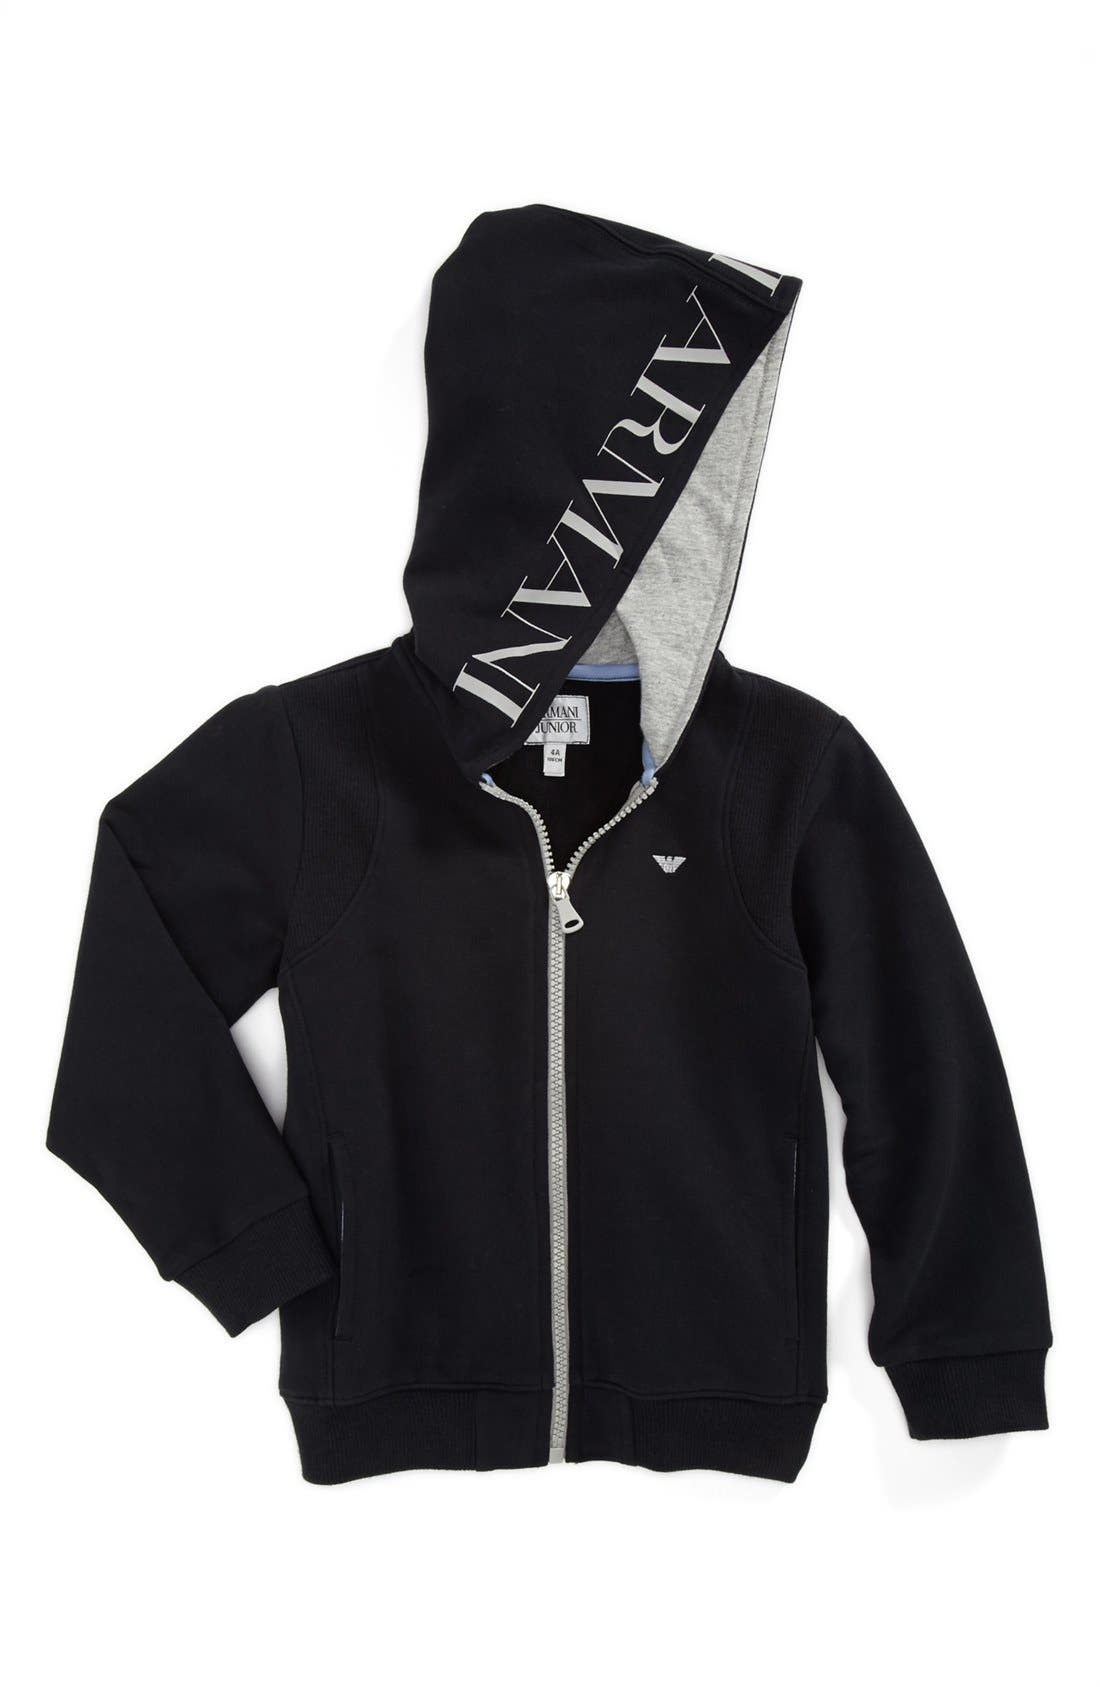 Main Image - Armani Junior Hooded Sweatshirt (Toddler Boys)